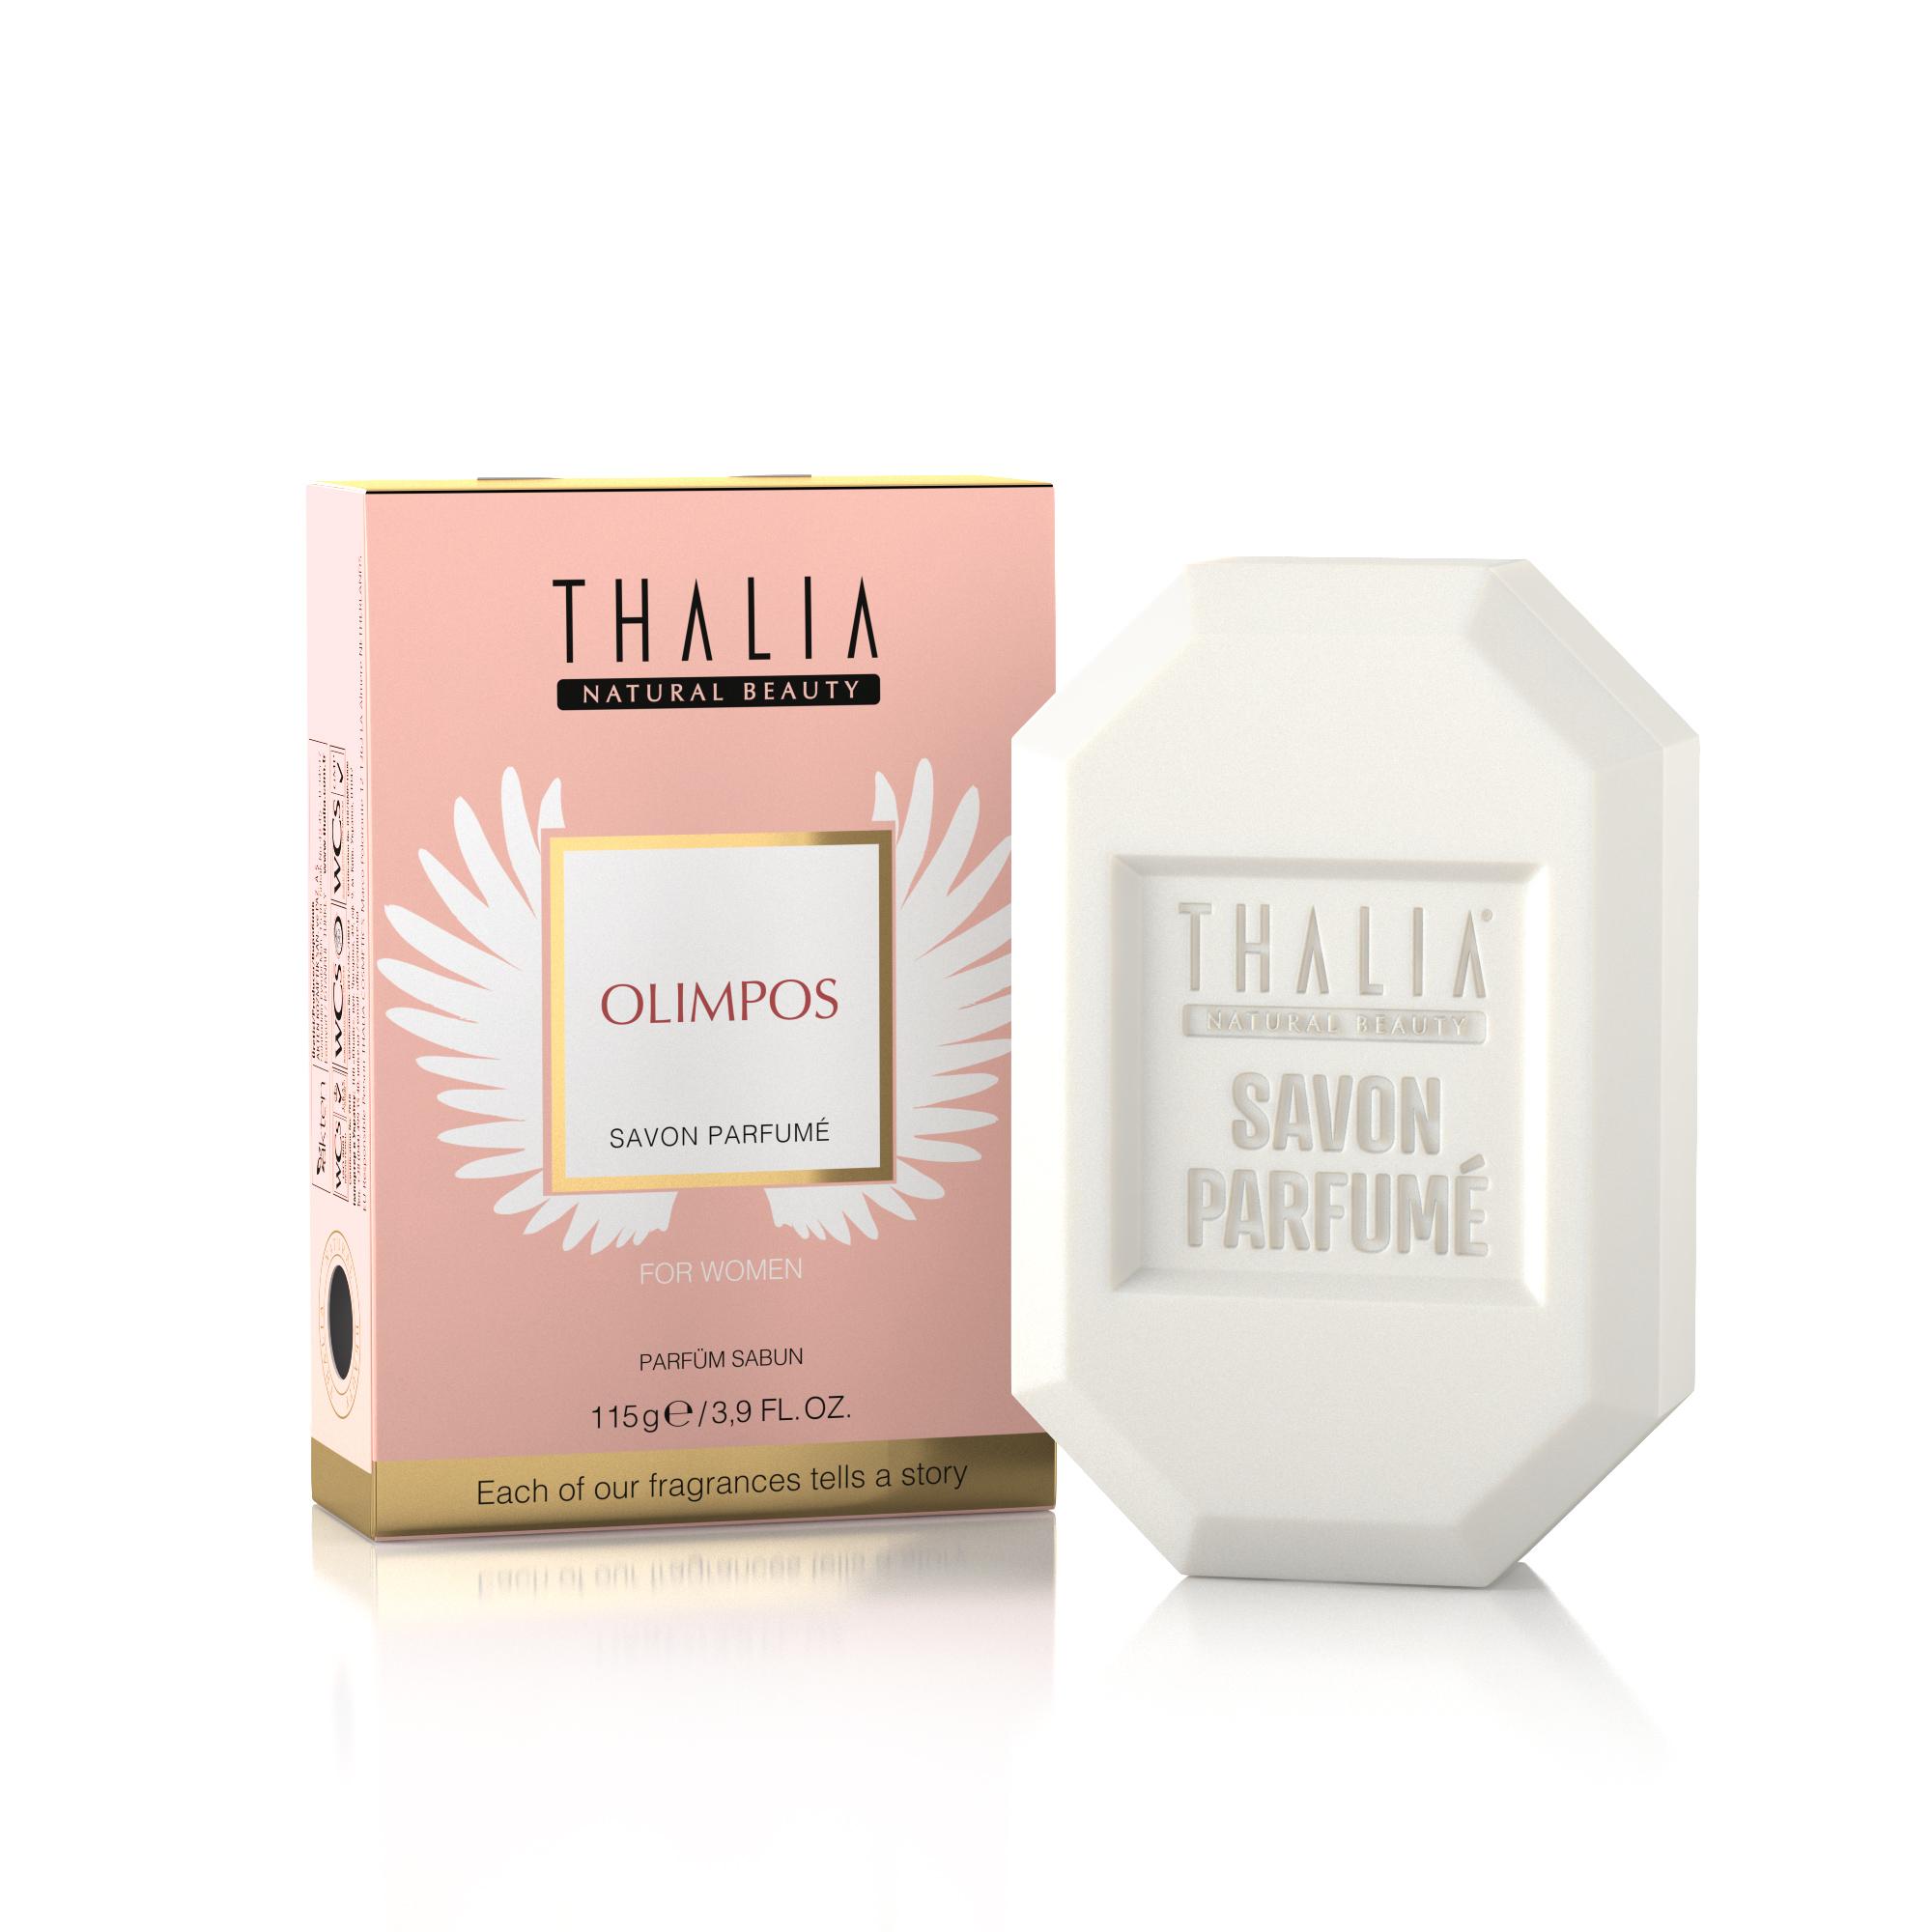 Olimpos Parfüm Sabun for Women - 115 gr.